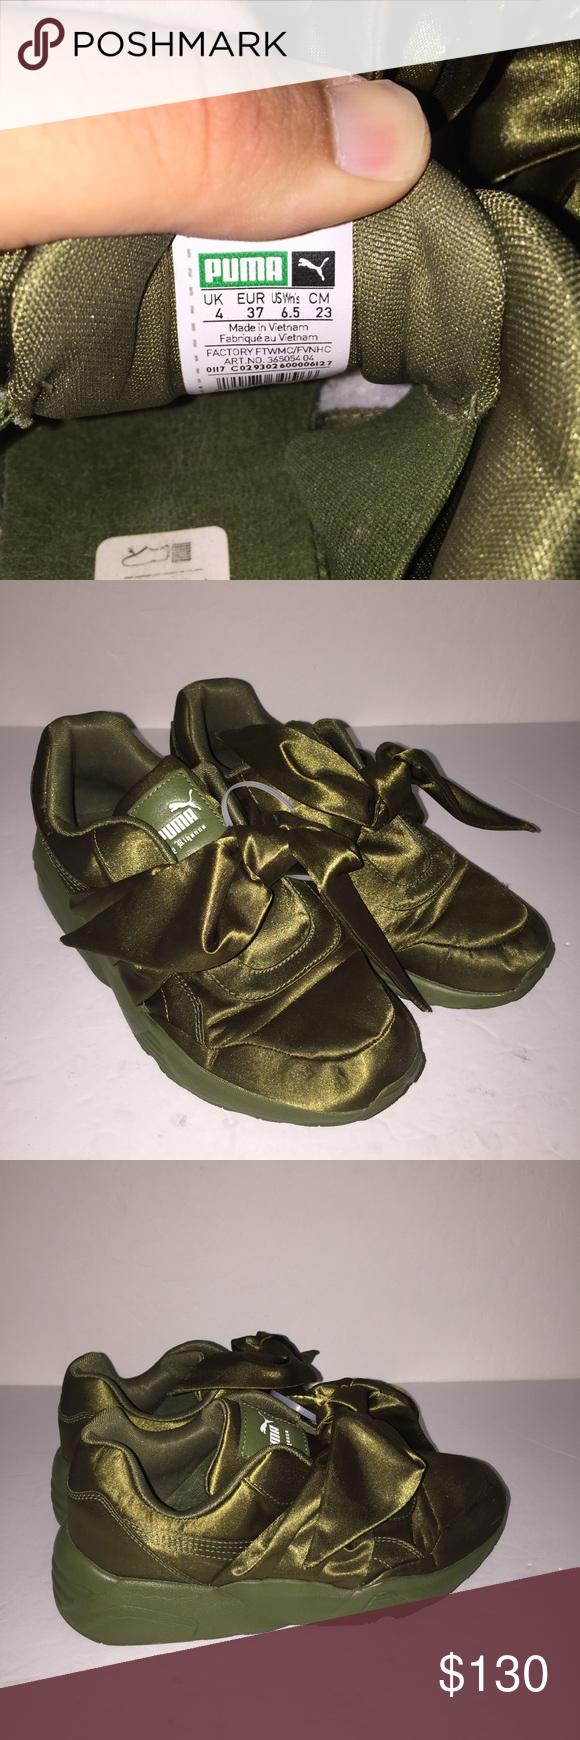 Puma Fenty Rihanna Olive Bow Trainer Sneaker 6.5 Gently worn before no box   abc1b70e6